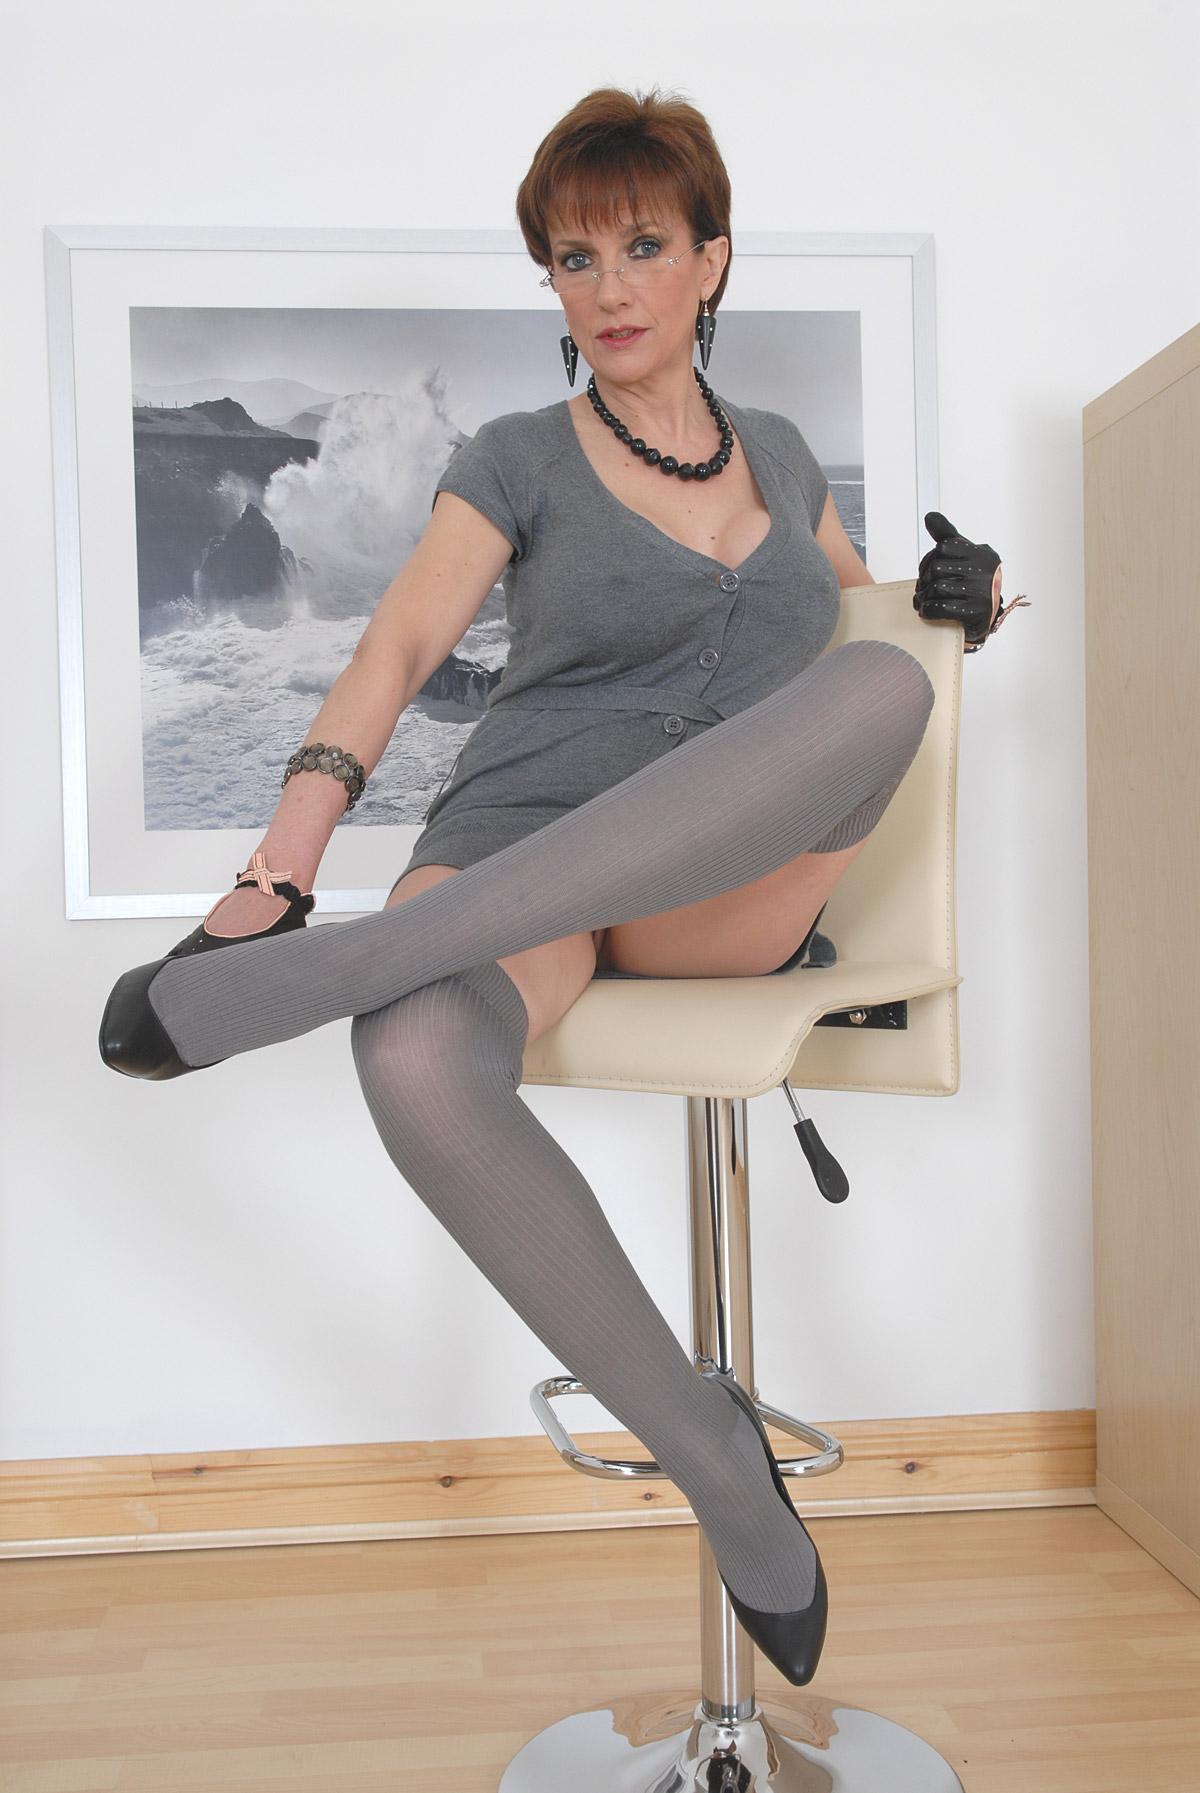 Magnificent lady sonia virtual handjob remarkable idea